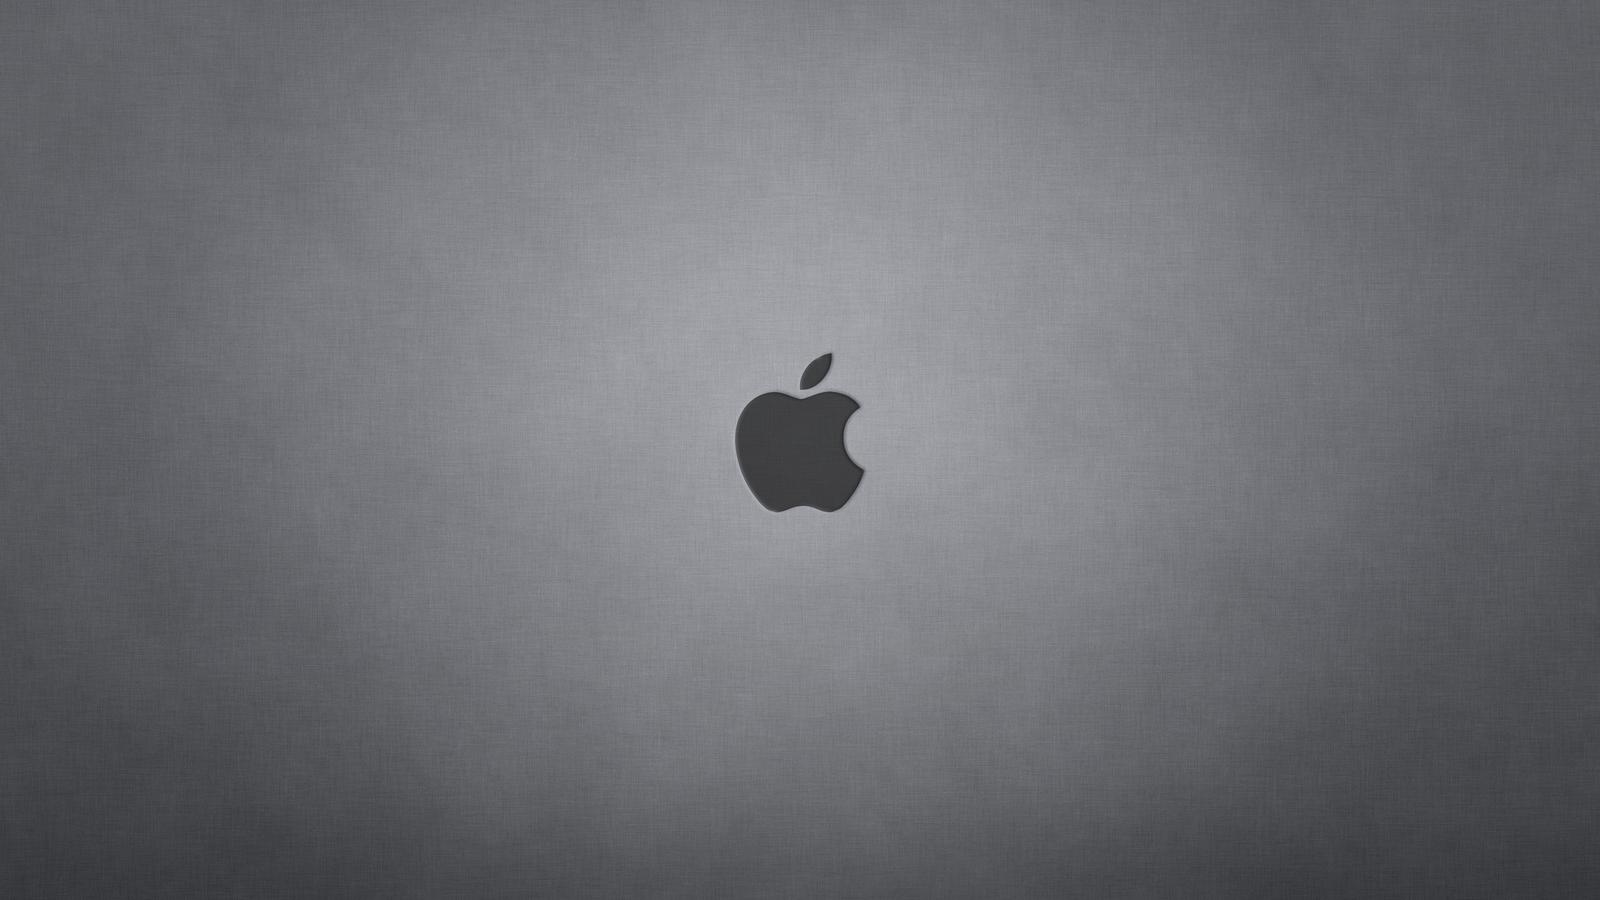 Mac OS Backgrounds 1600x900